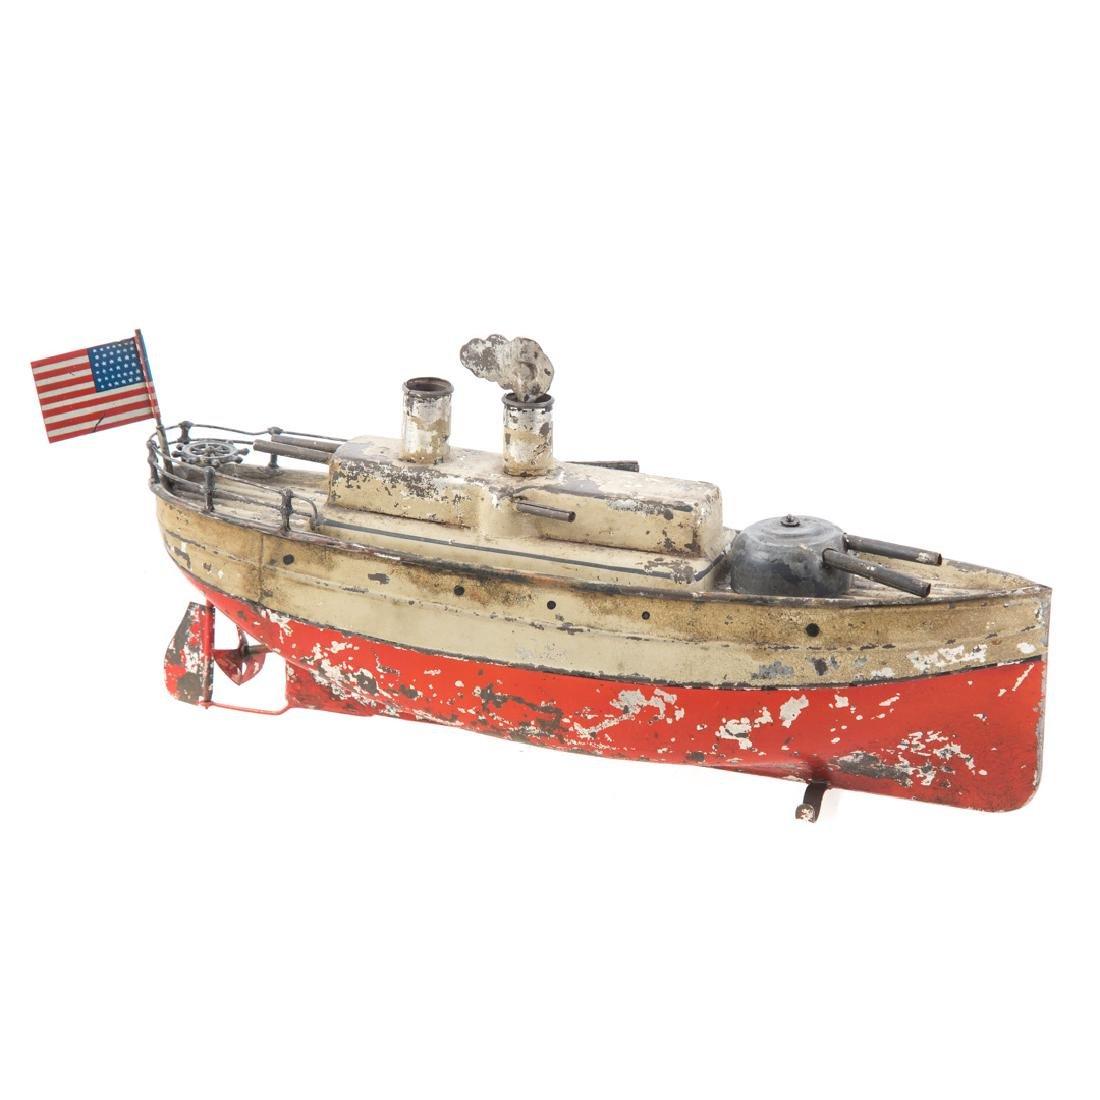 Georges Carette tinplate armored cruiser